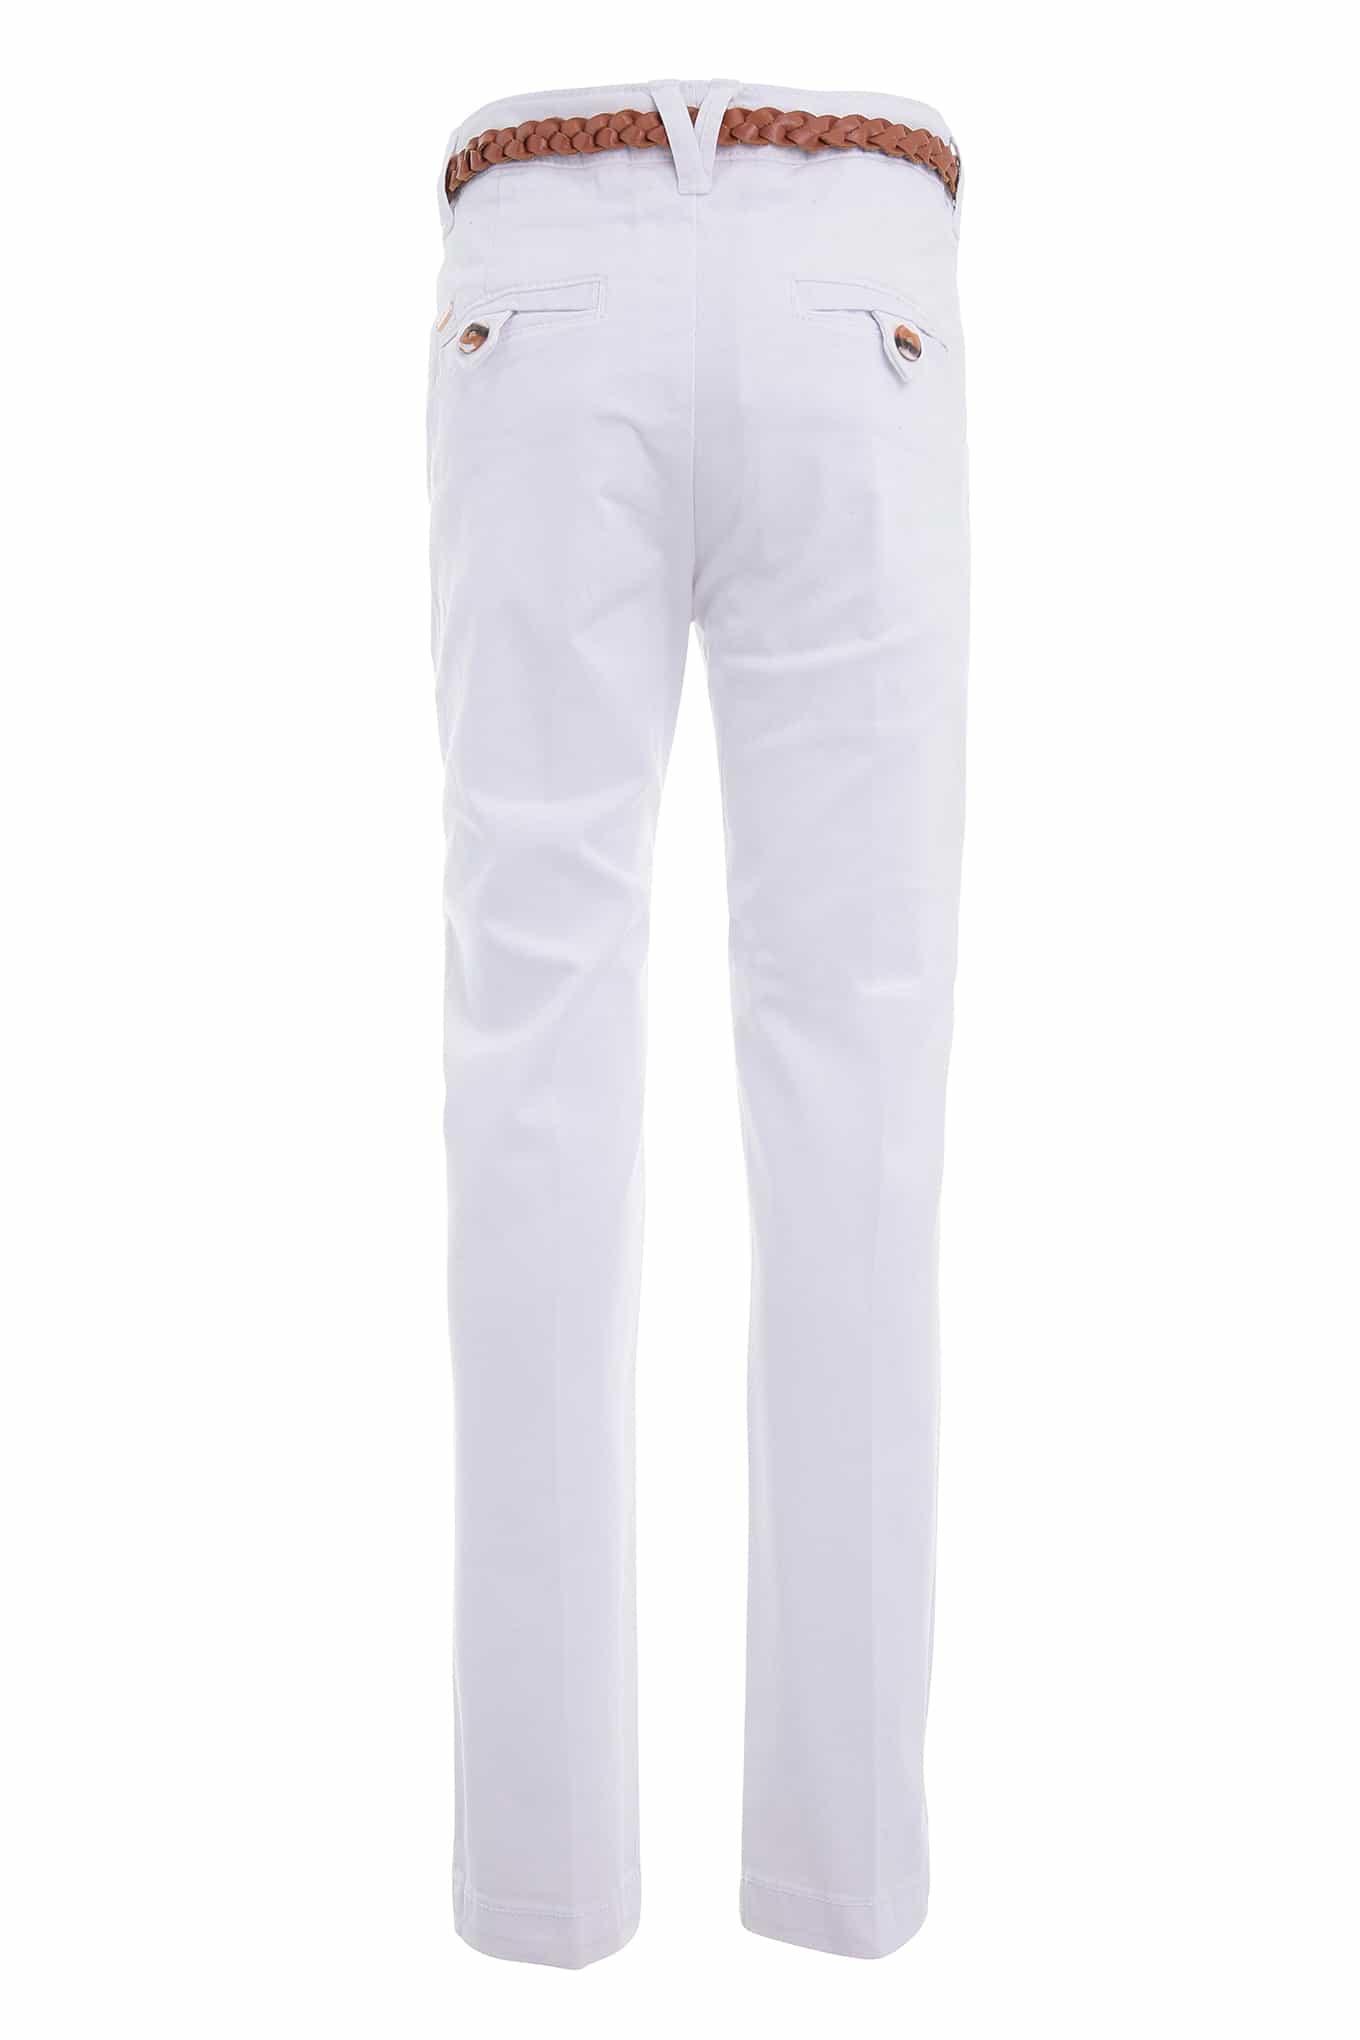 Calças Chino Branco Casual Rapariga